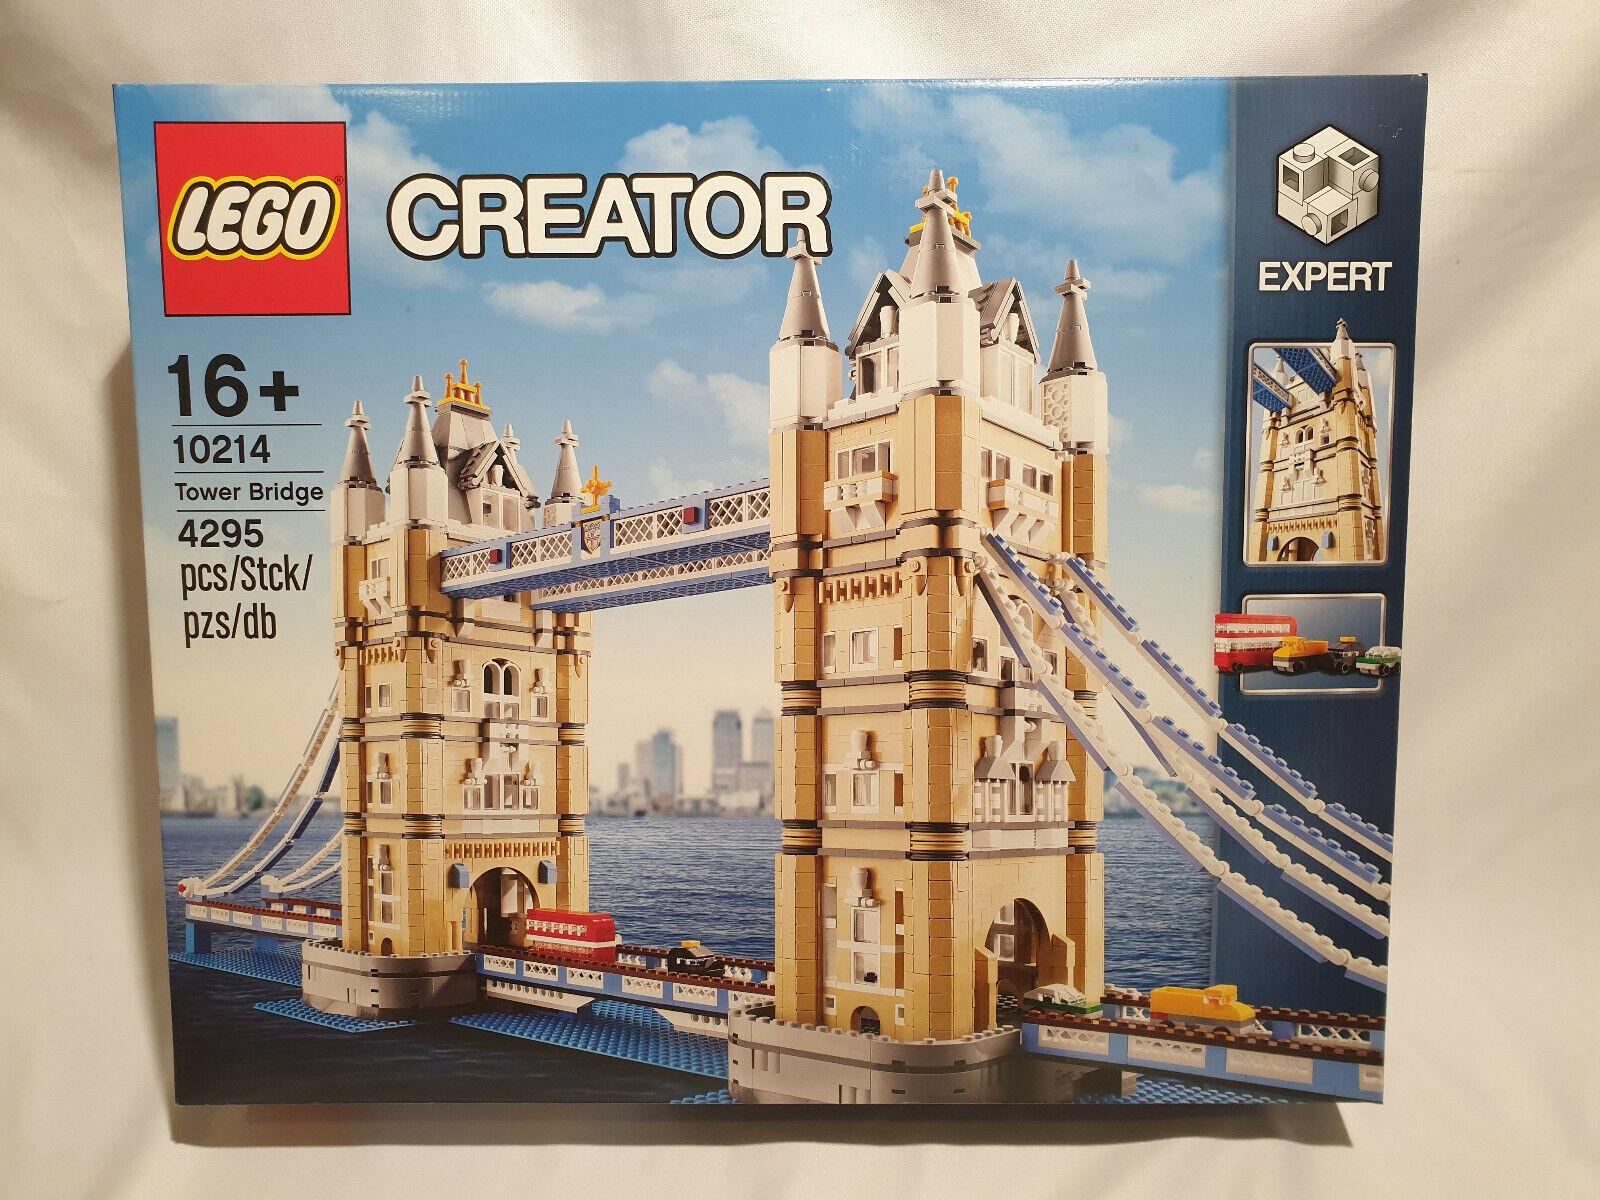 LEGO 10214 CREATOR Tower Bridge  NEUF, SCELLE  alta qualità generale